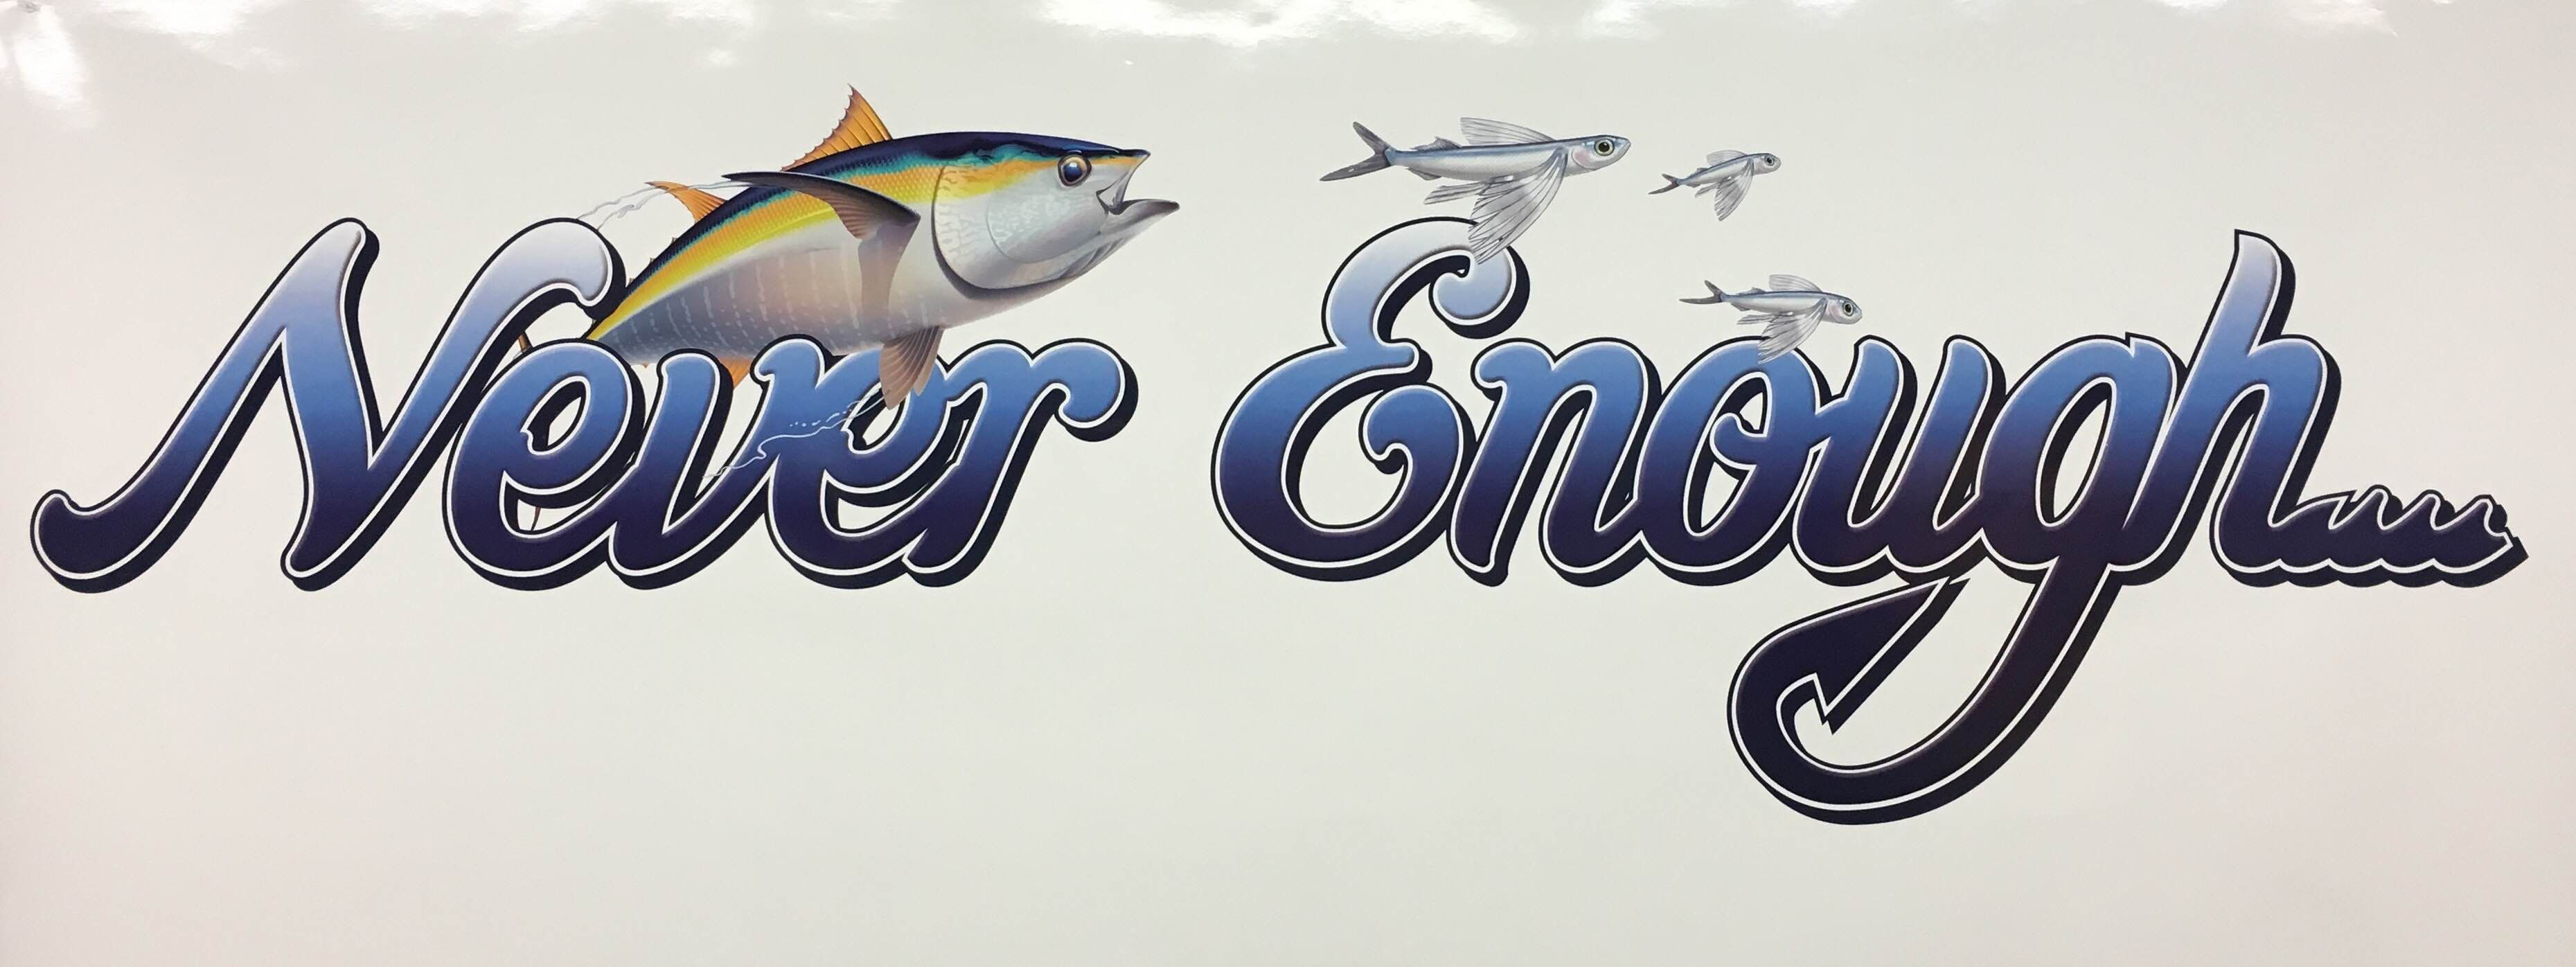 Never Enough Boat Lettering | Boat Graphics | Custom vinyl